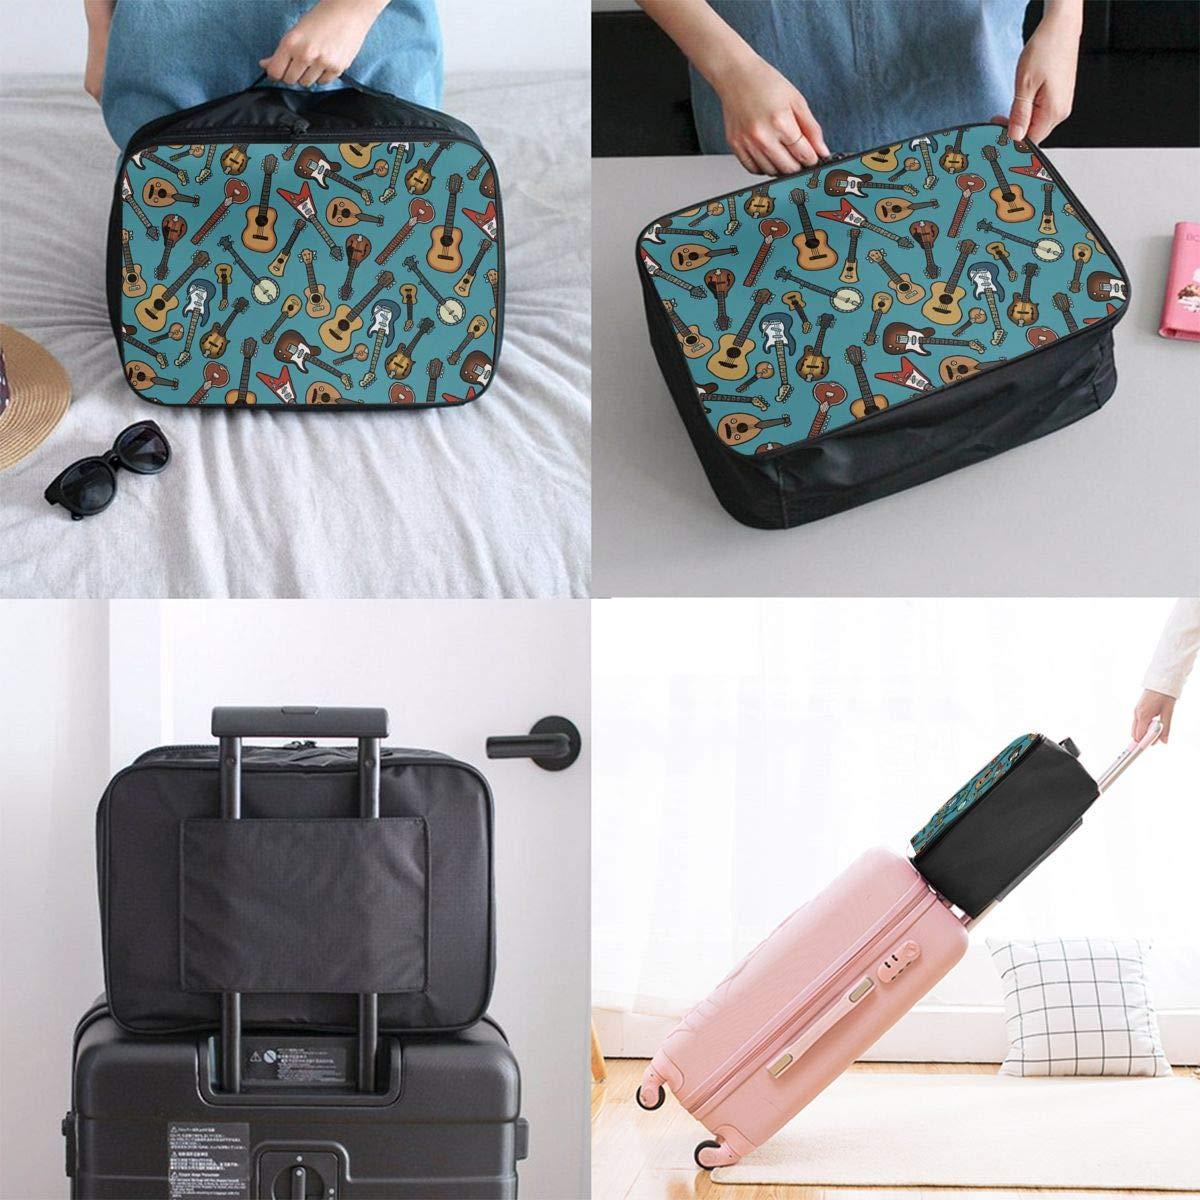 Guitars Pattern Travel Duffle Bag Large Lightweight Weekend Bags Nylon Luggage Hanging Bag Waterproof Luggage Duffel Bag In Trolley Handle For Sports Gym